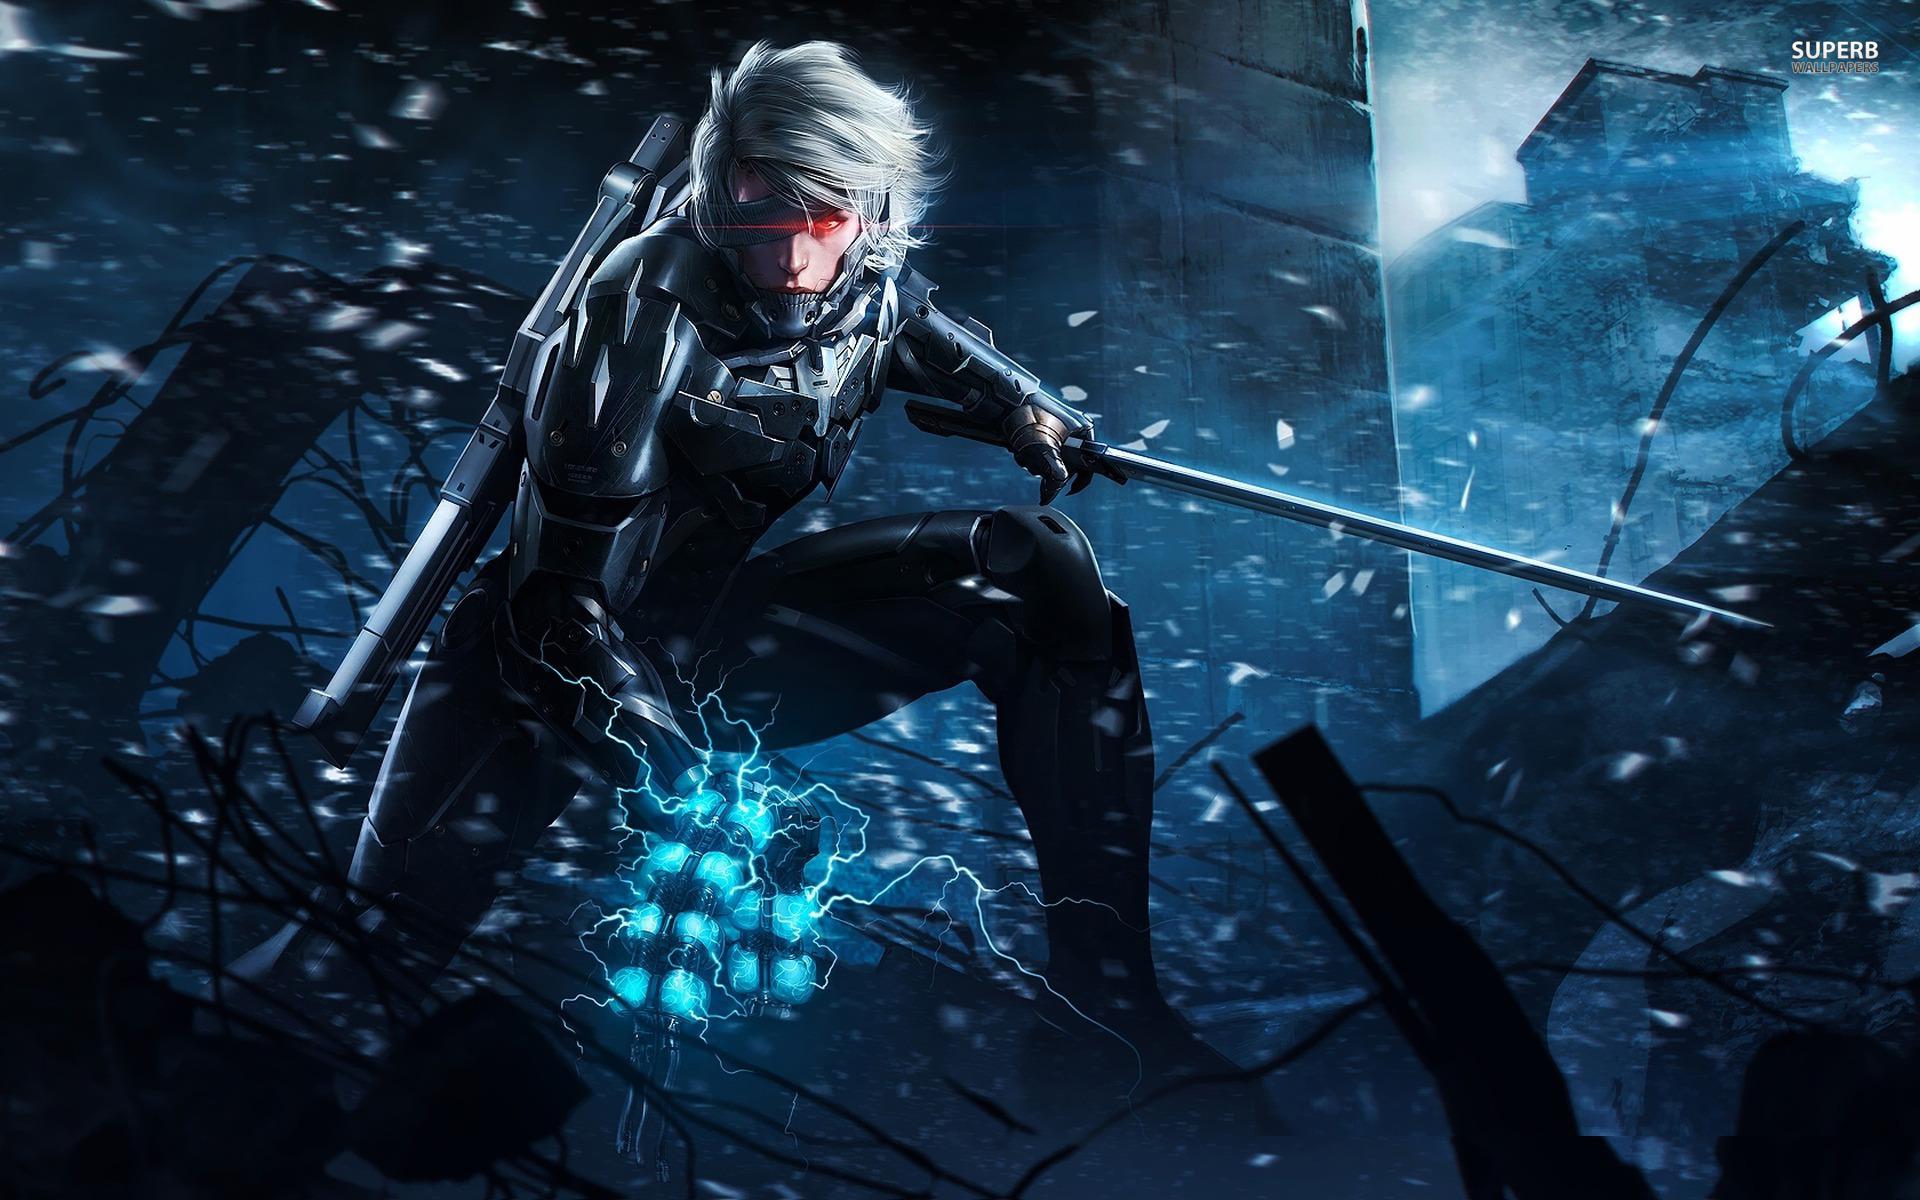 Metal Gear Rising: Revengeance wallpaper 1920x1200 jpg